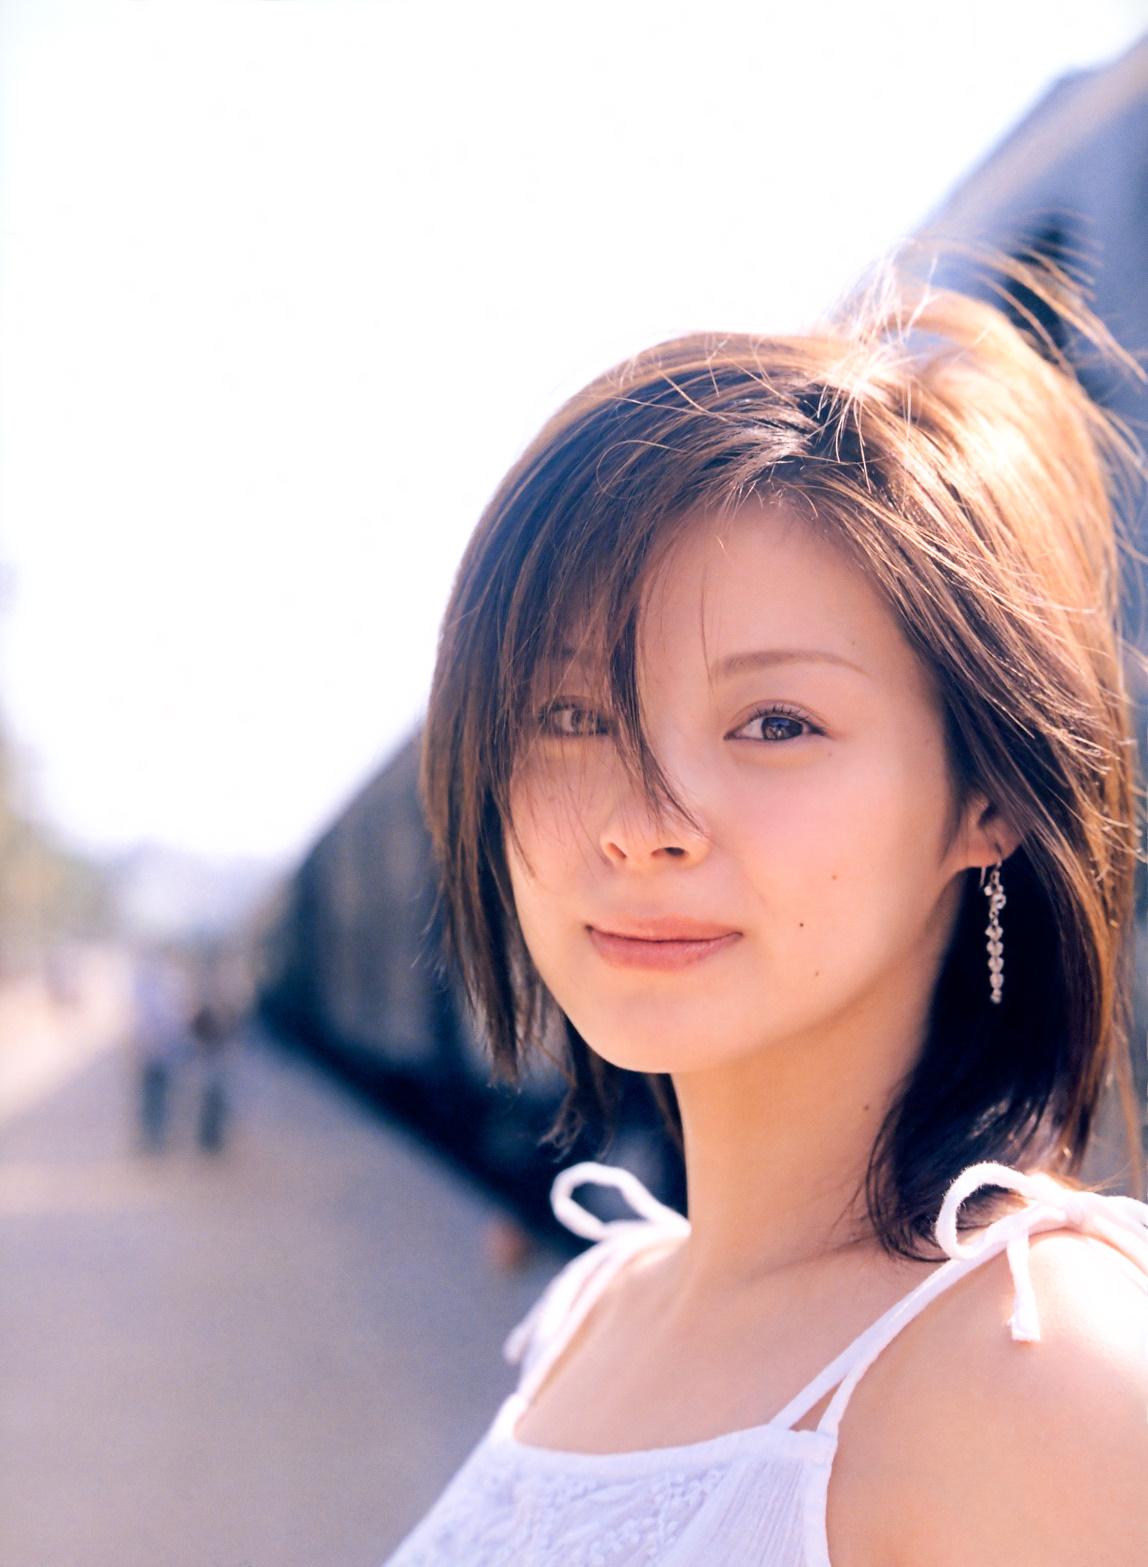 AyaMatsuura-A_PH5-06.jpg